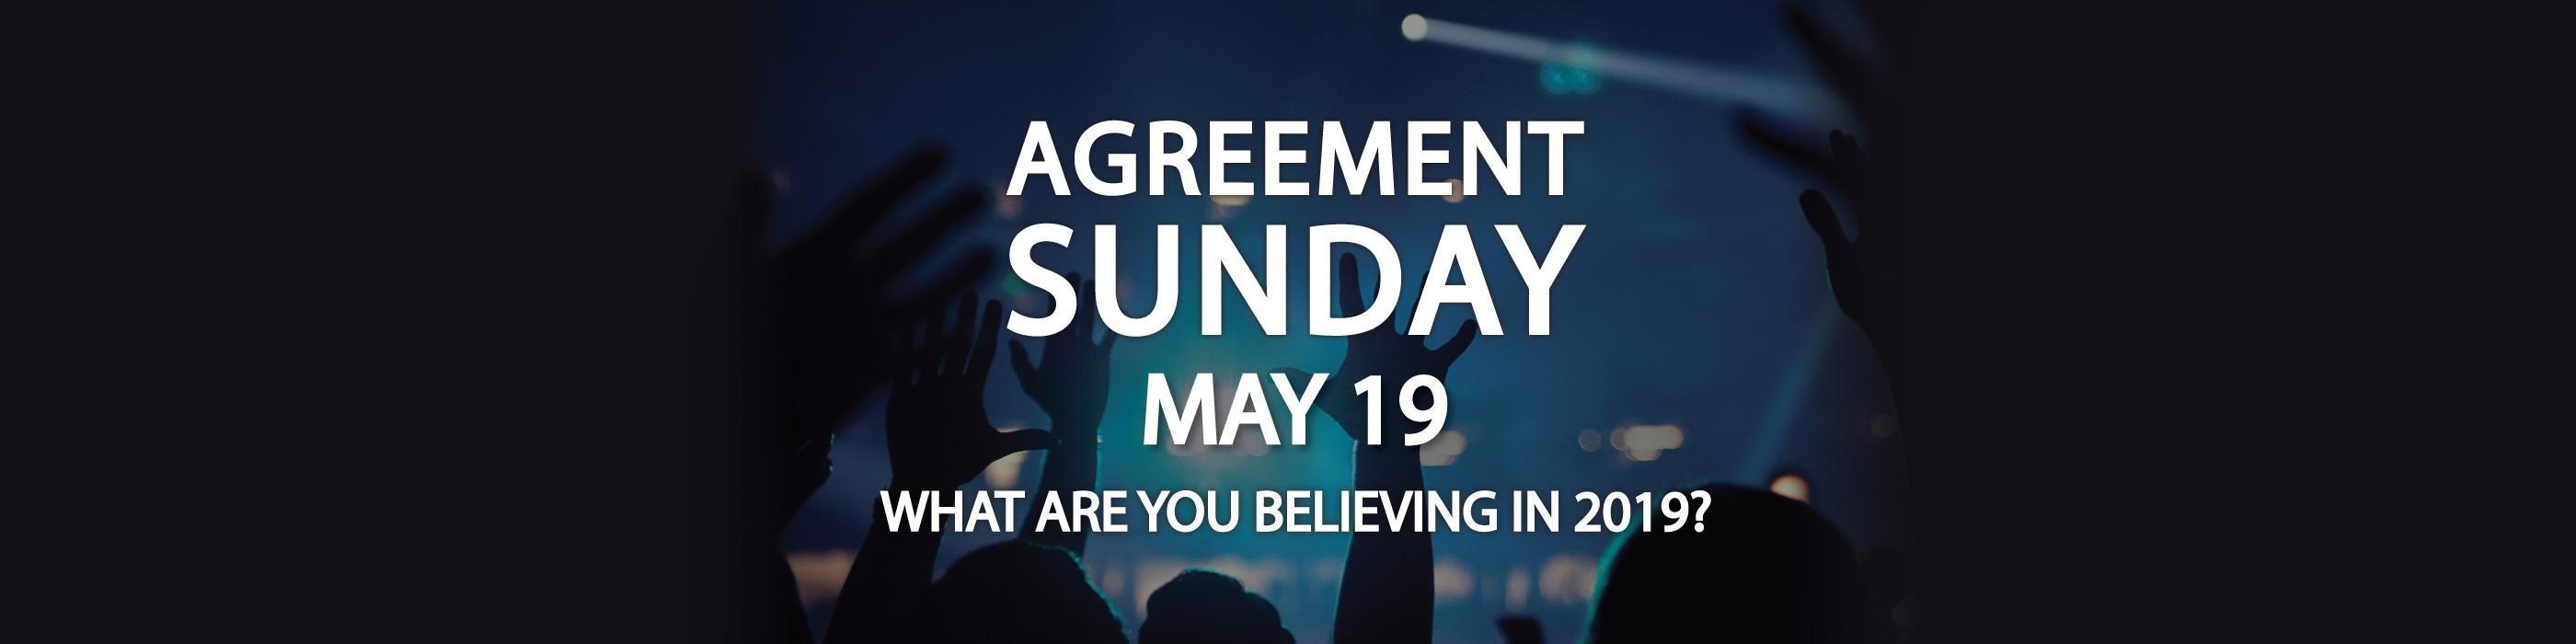 Summit-Church-Agreement-Sunday-WEB-2800x700